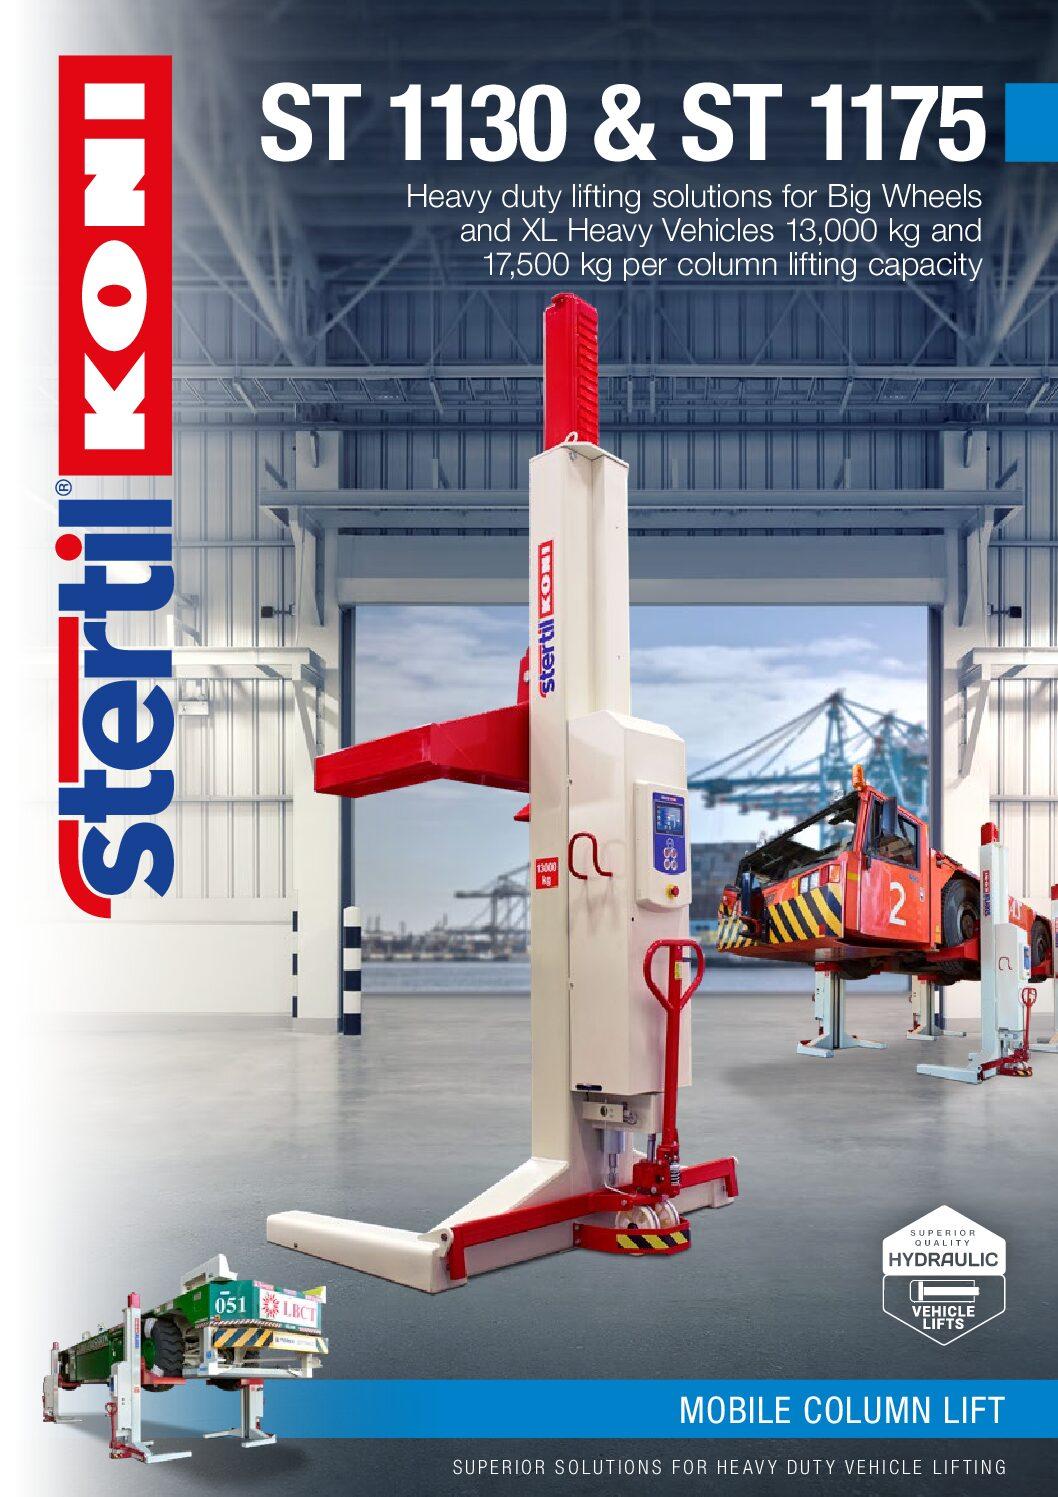 Stertil-Koni: ST 1130 and ST 1175 – GB Version